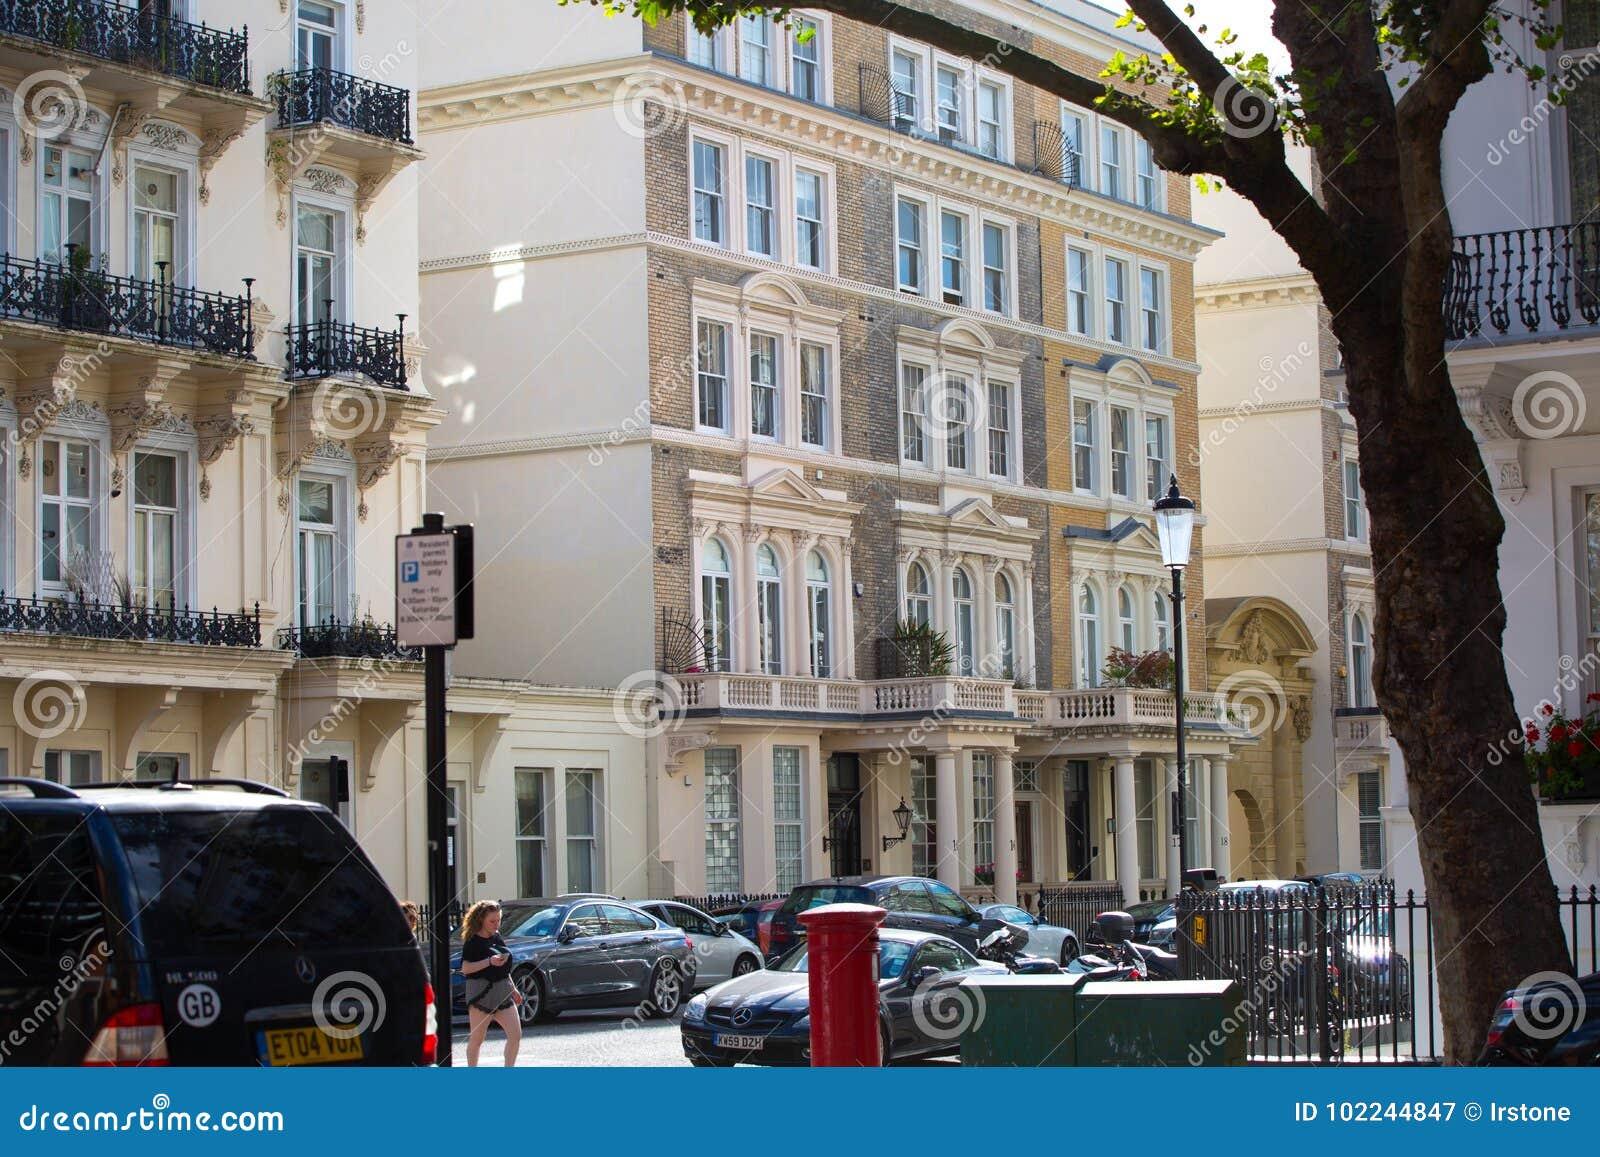 Luxury Apartment Buildings In Kensington. Centre London Residential ...